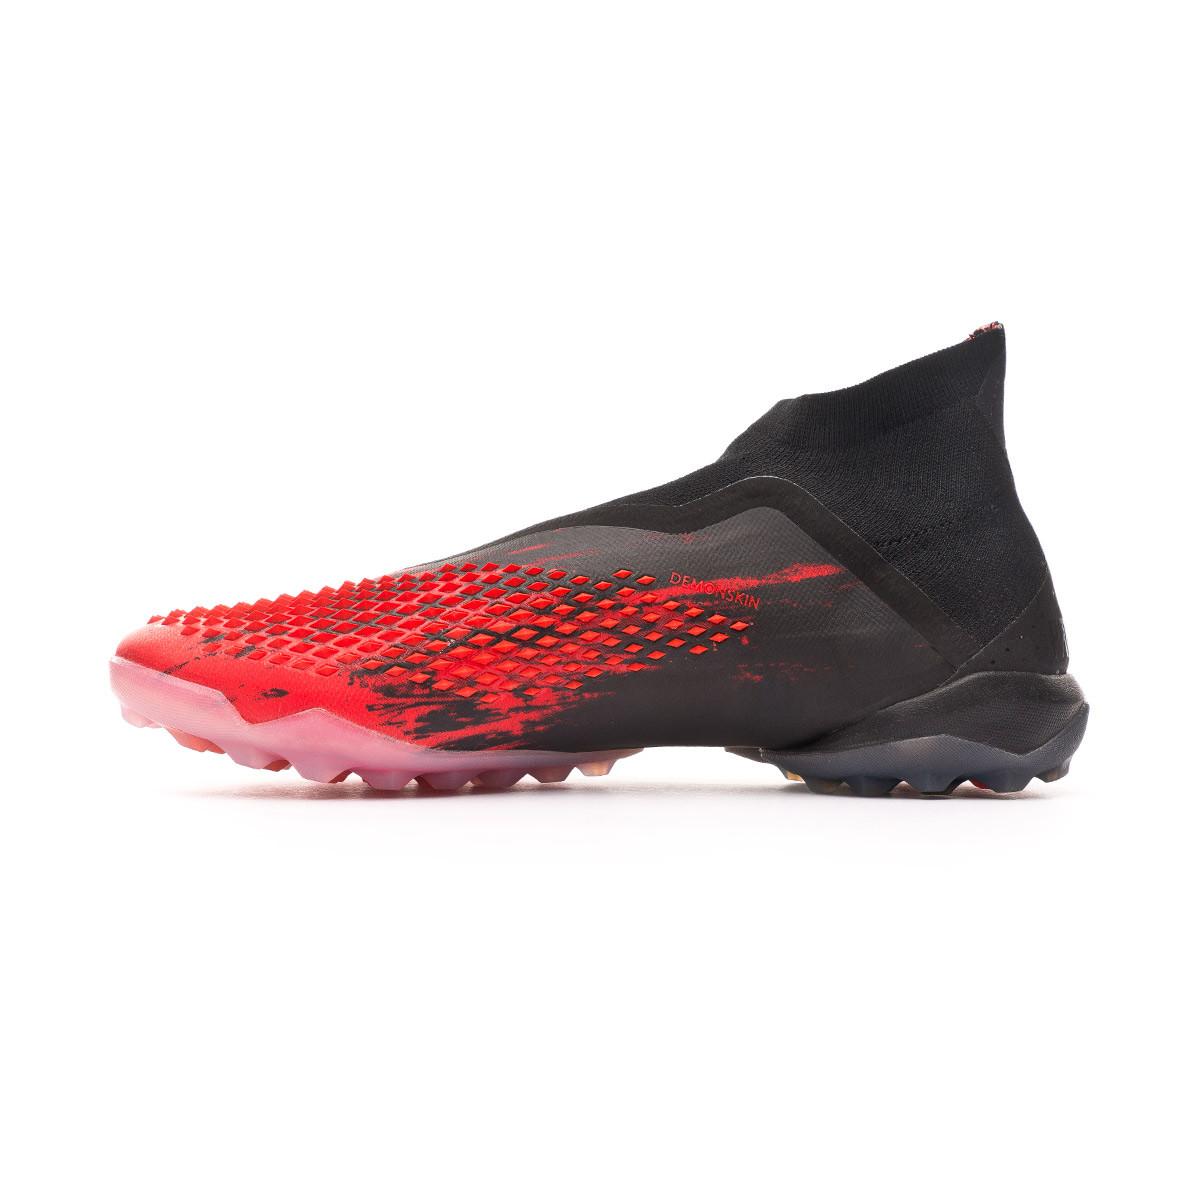 Chaussure de football adidas Predator 20+ Turf